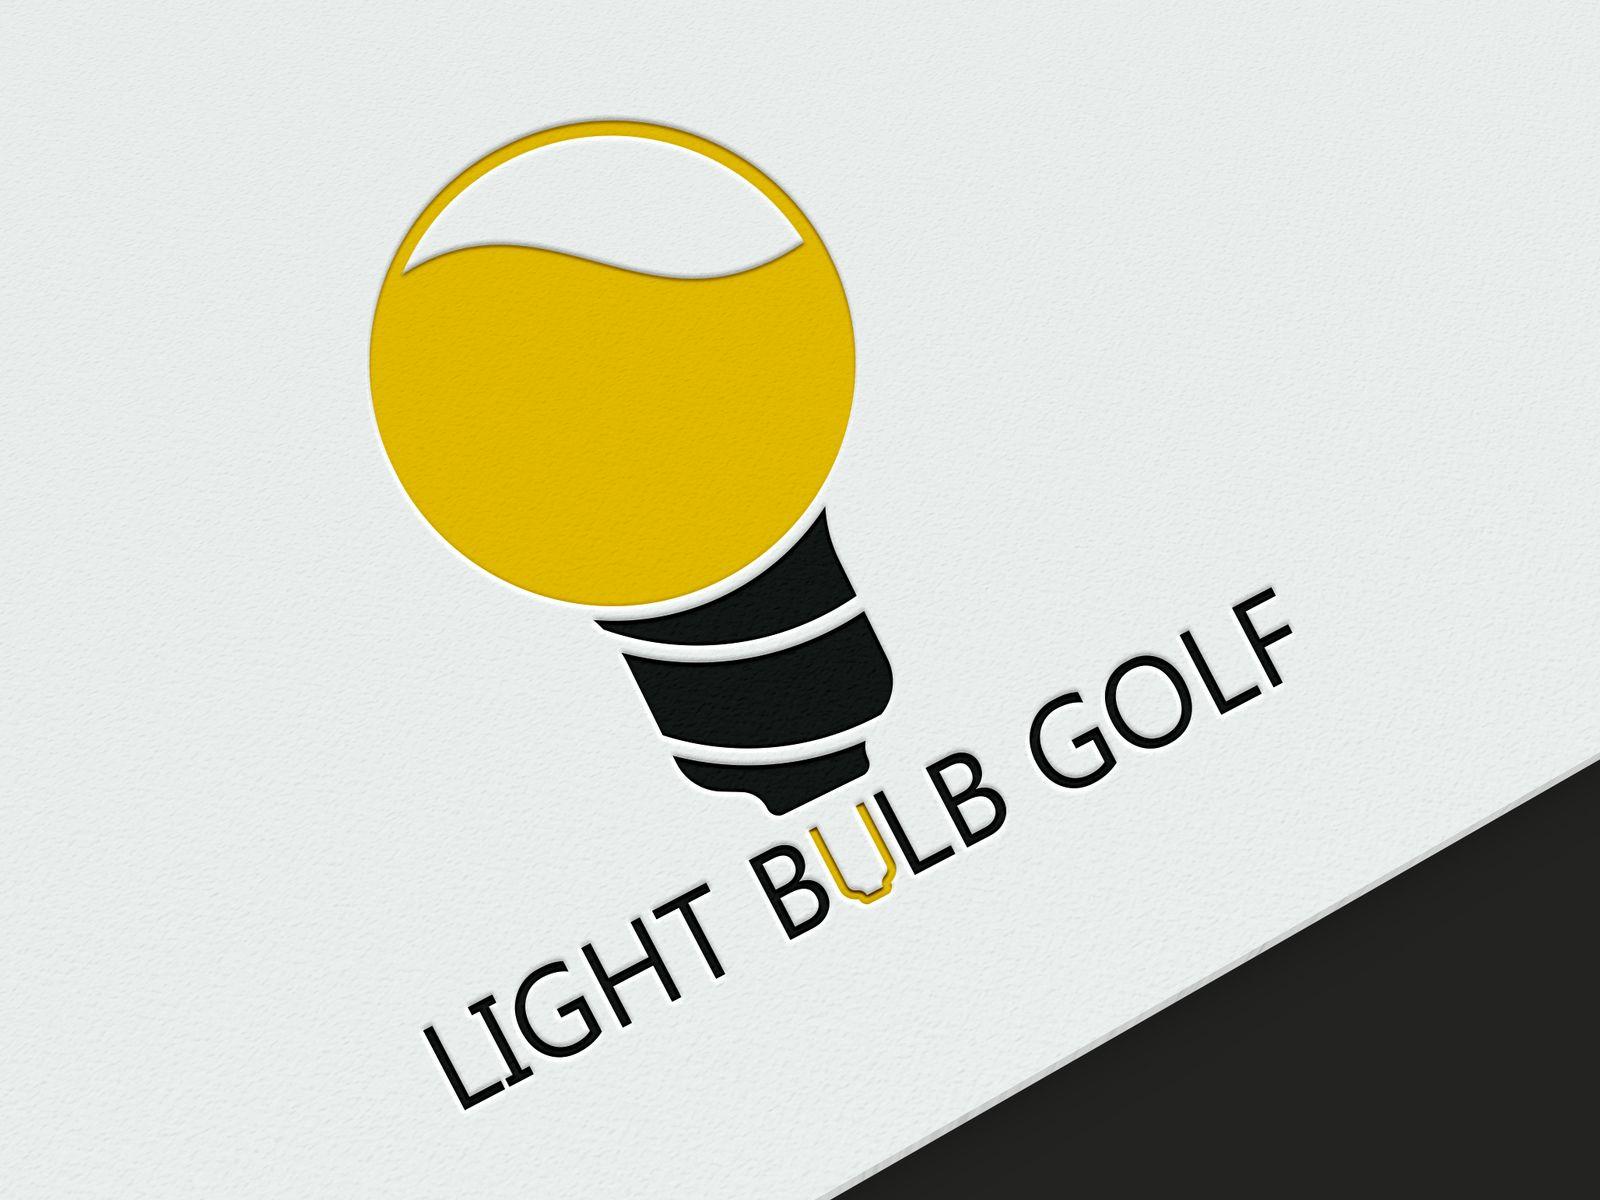 Light bulb golf drawing illustration creative logo flat